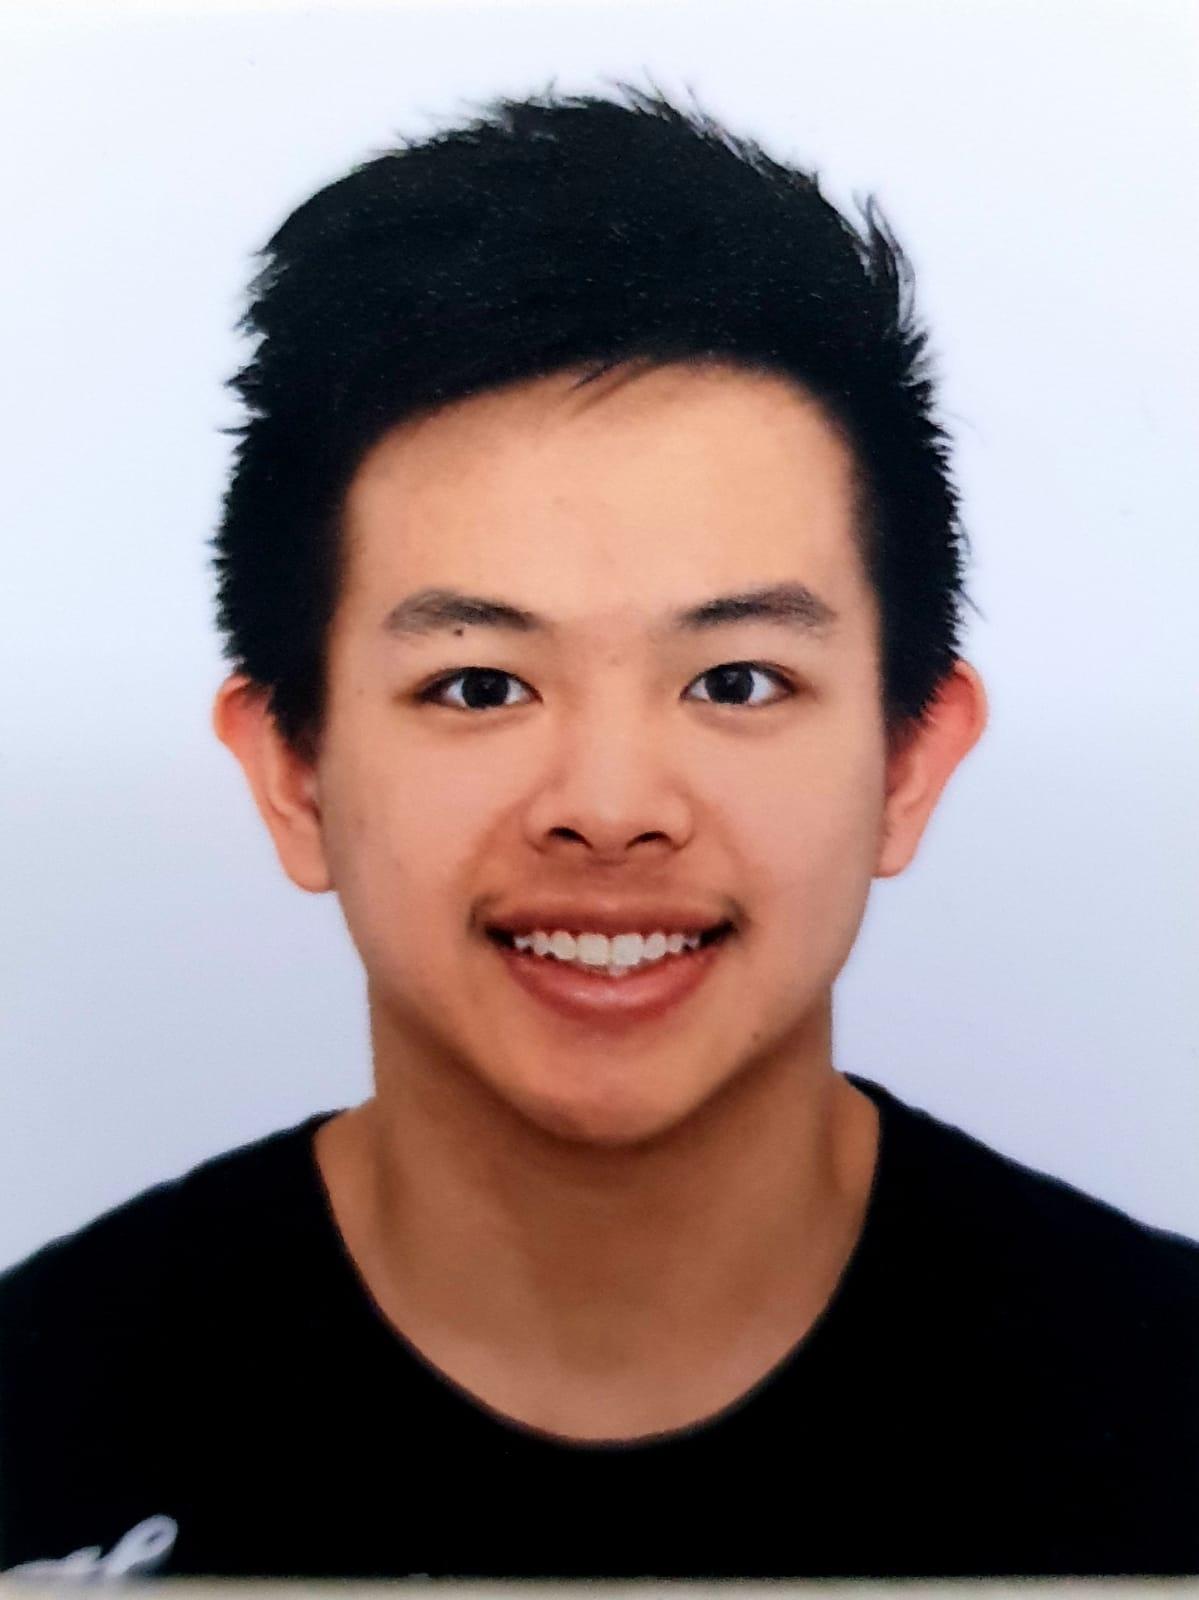 Leong Guo Rui, Marcus